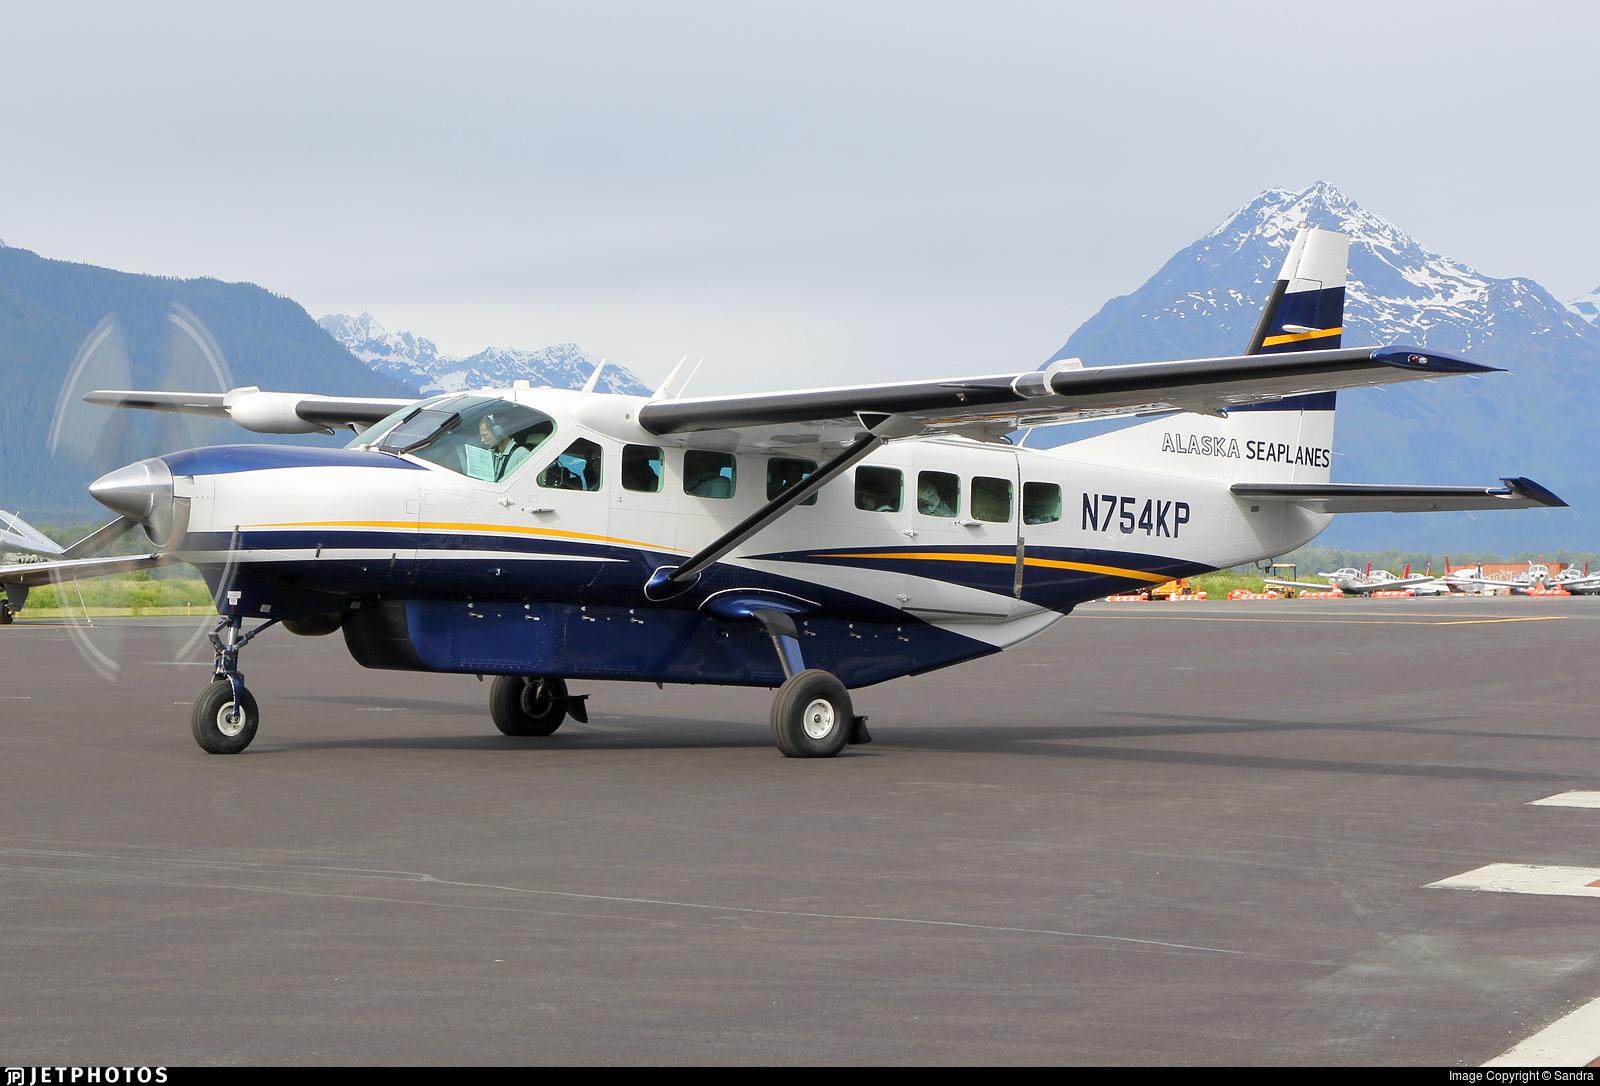 N846ax aircraft